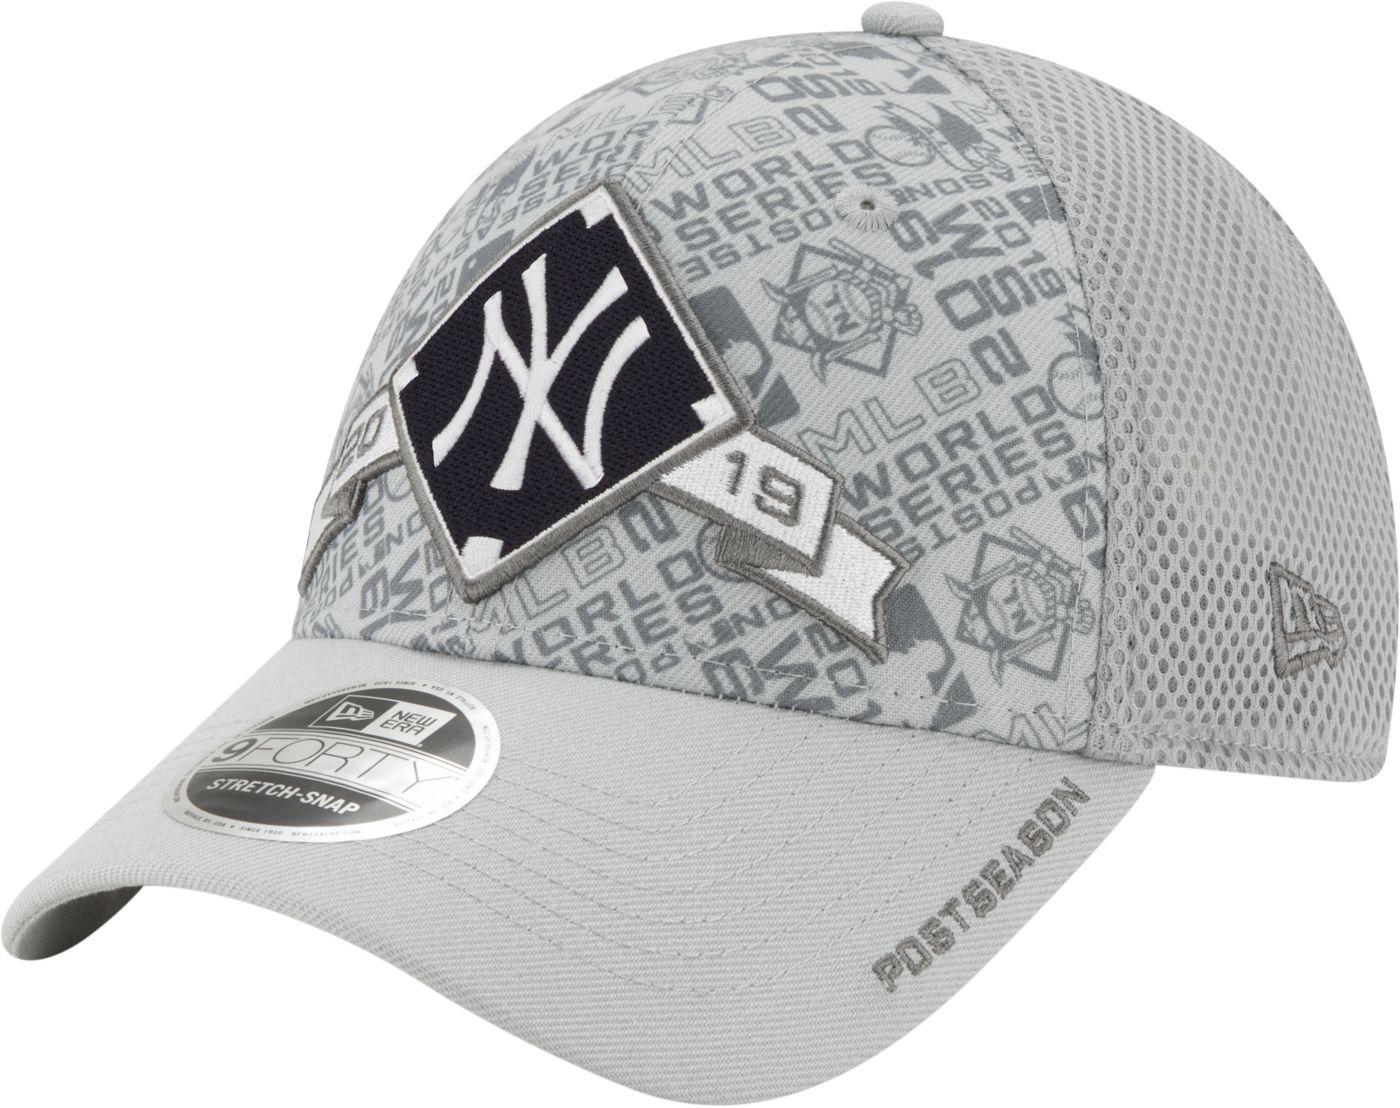 New Era Men's New York Yankees 2019 LDS Clincher Locker Room 9Forty Adjustable Hat